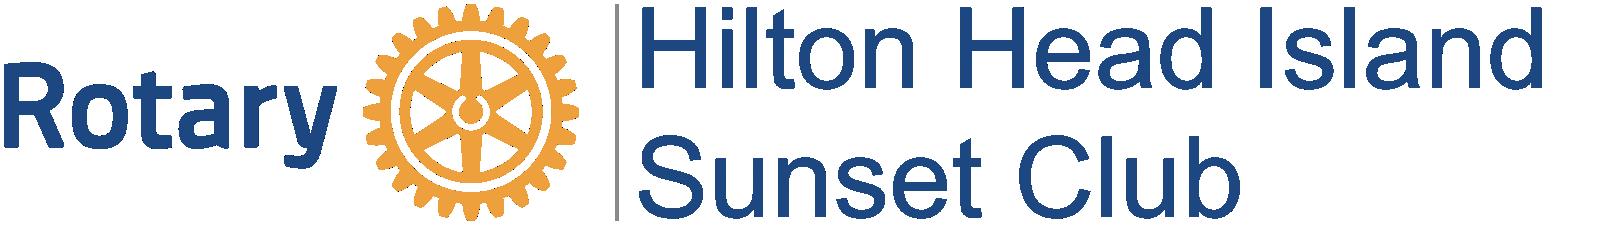 Hilton Head Island S logo